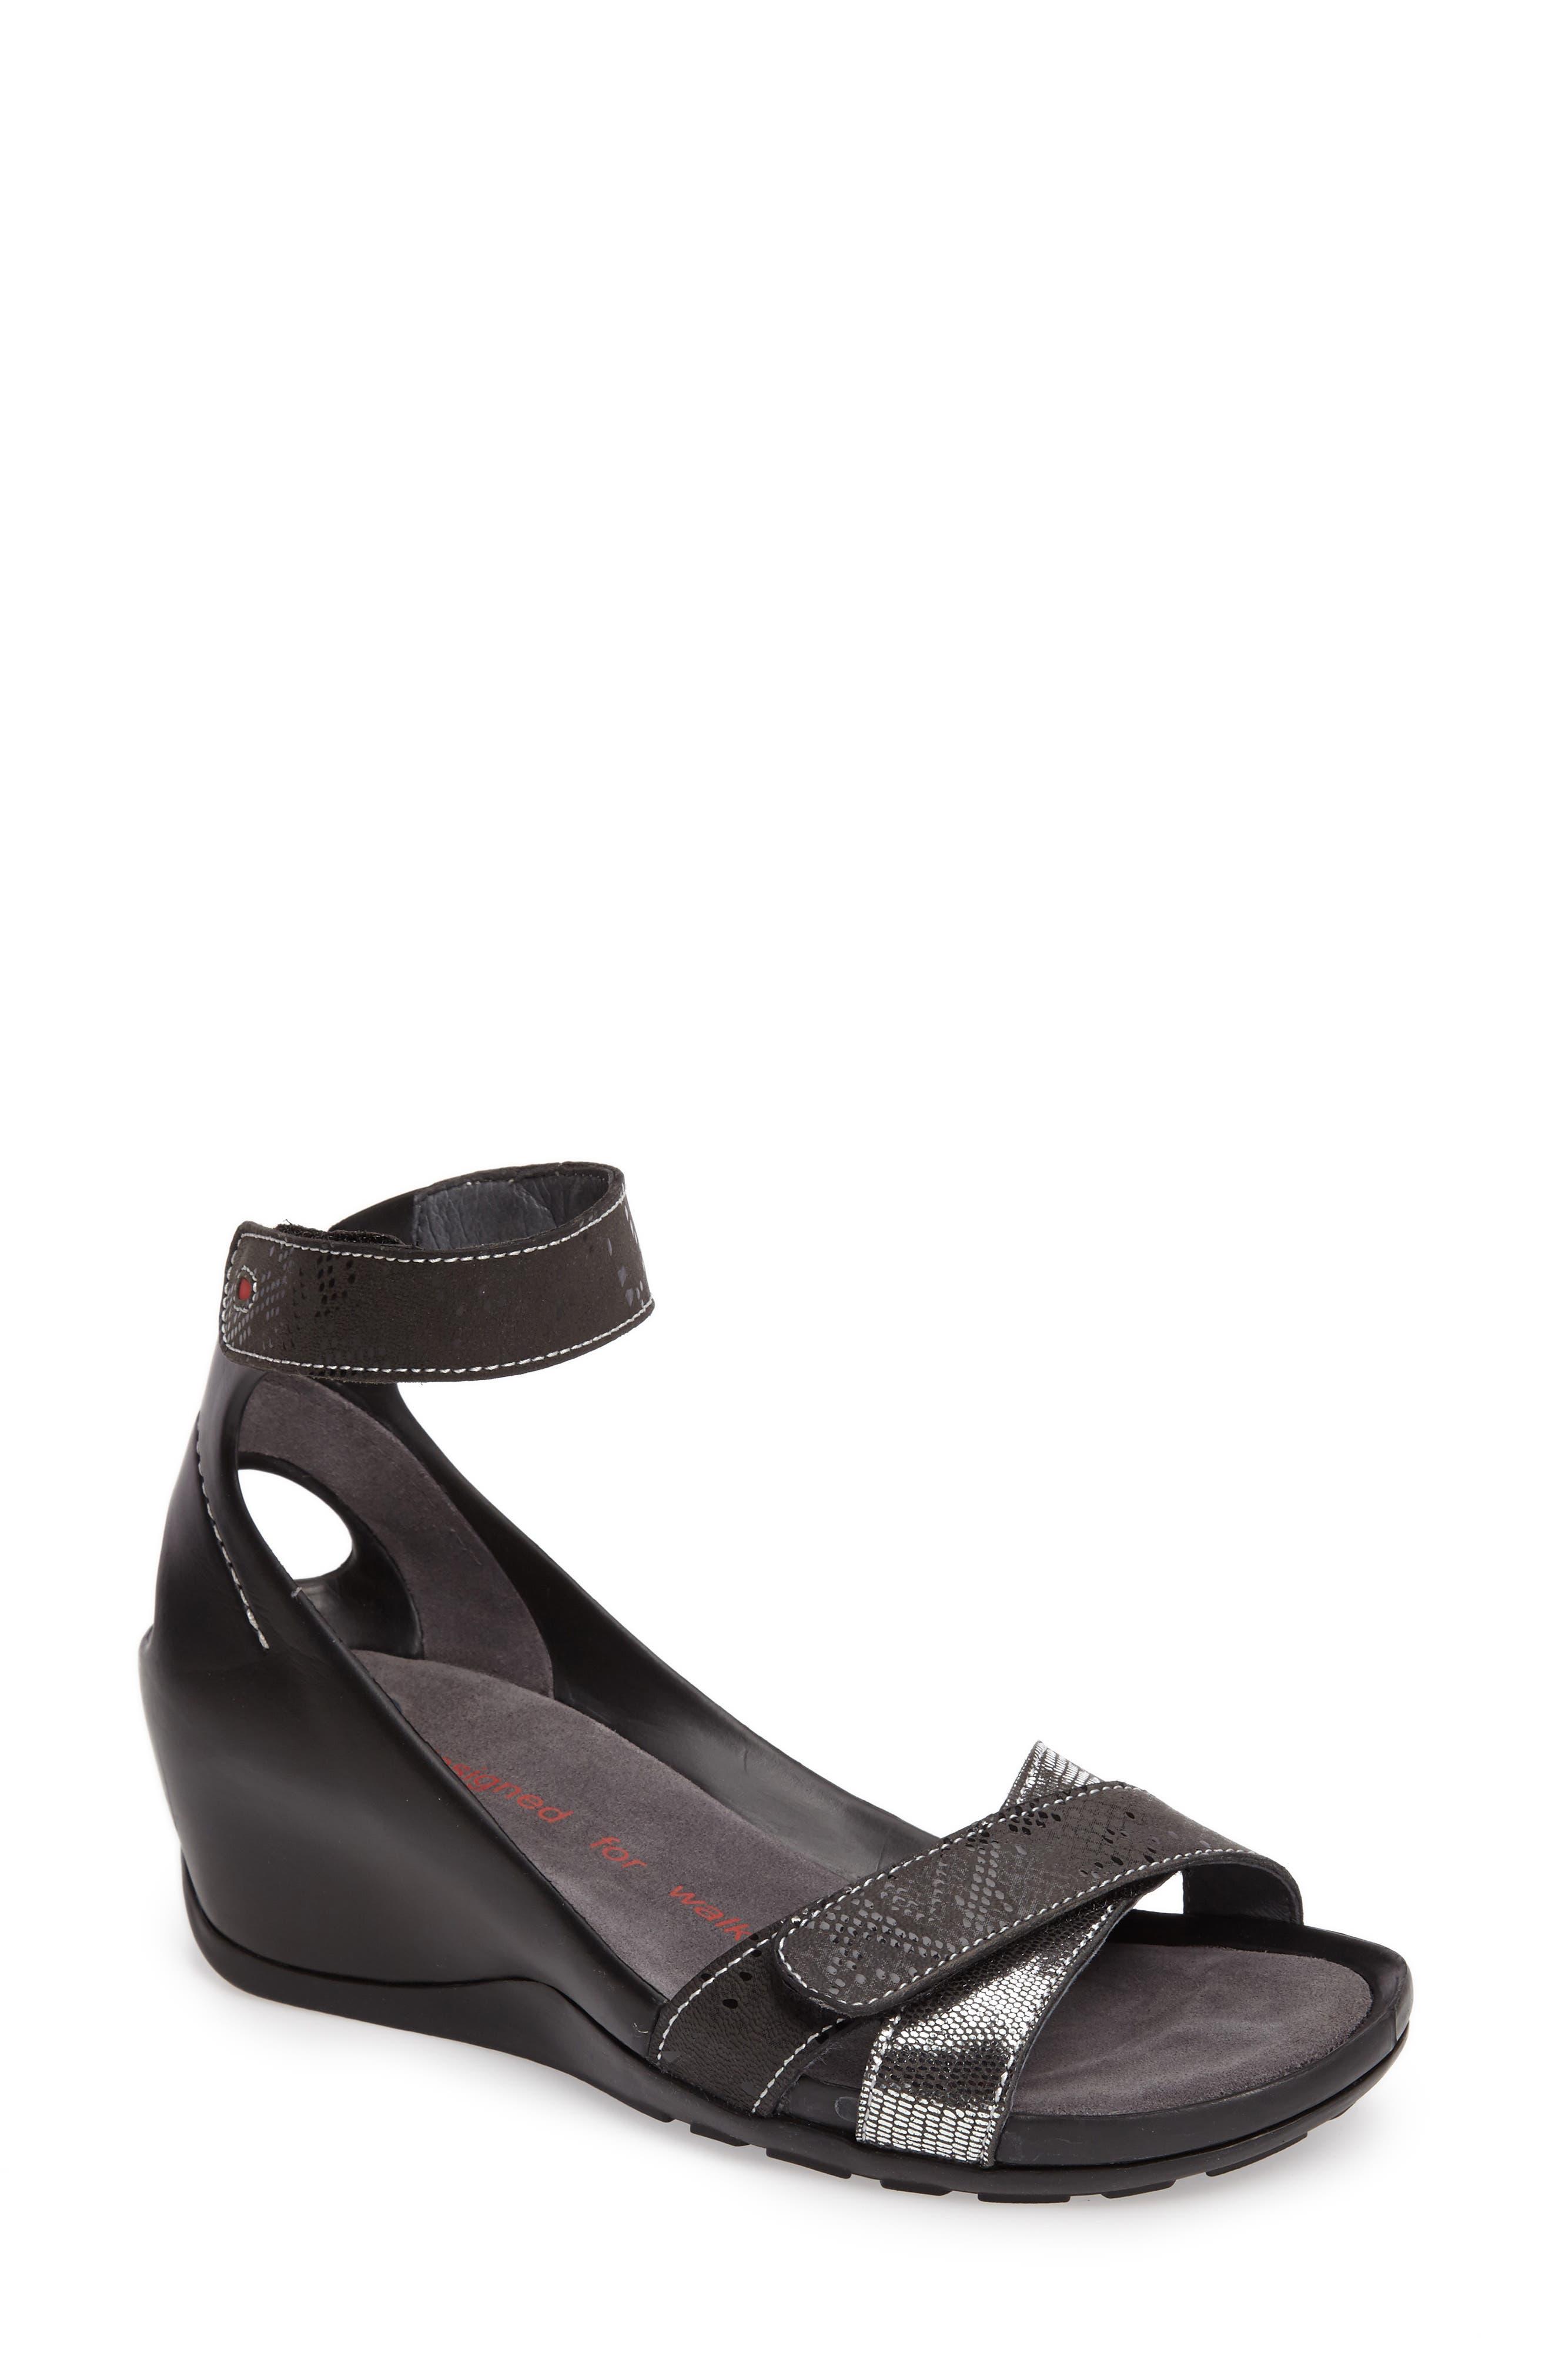 Wolky Do Wedge Sandal (Women)